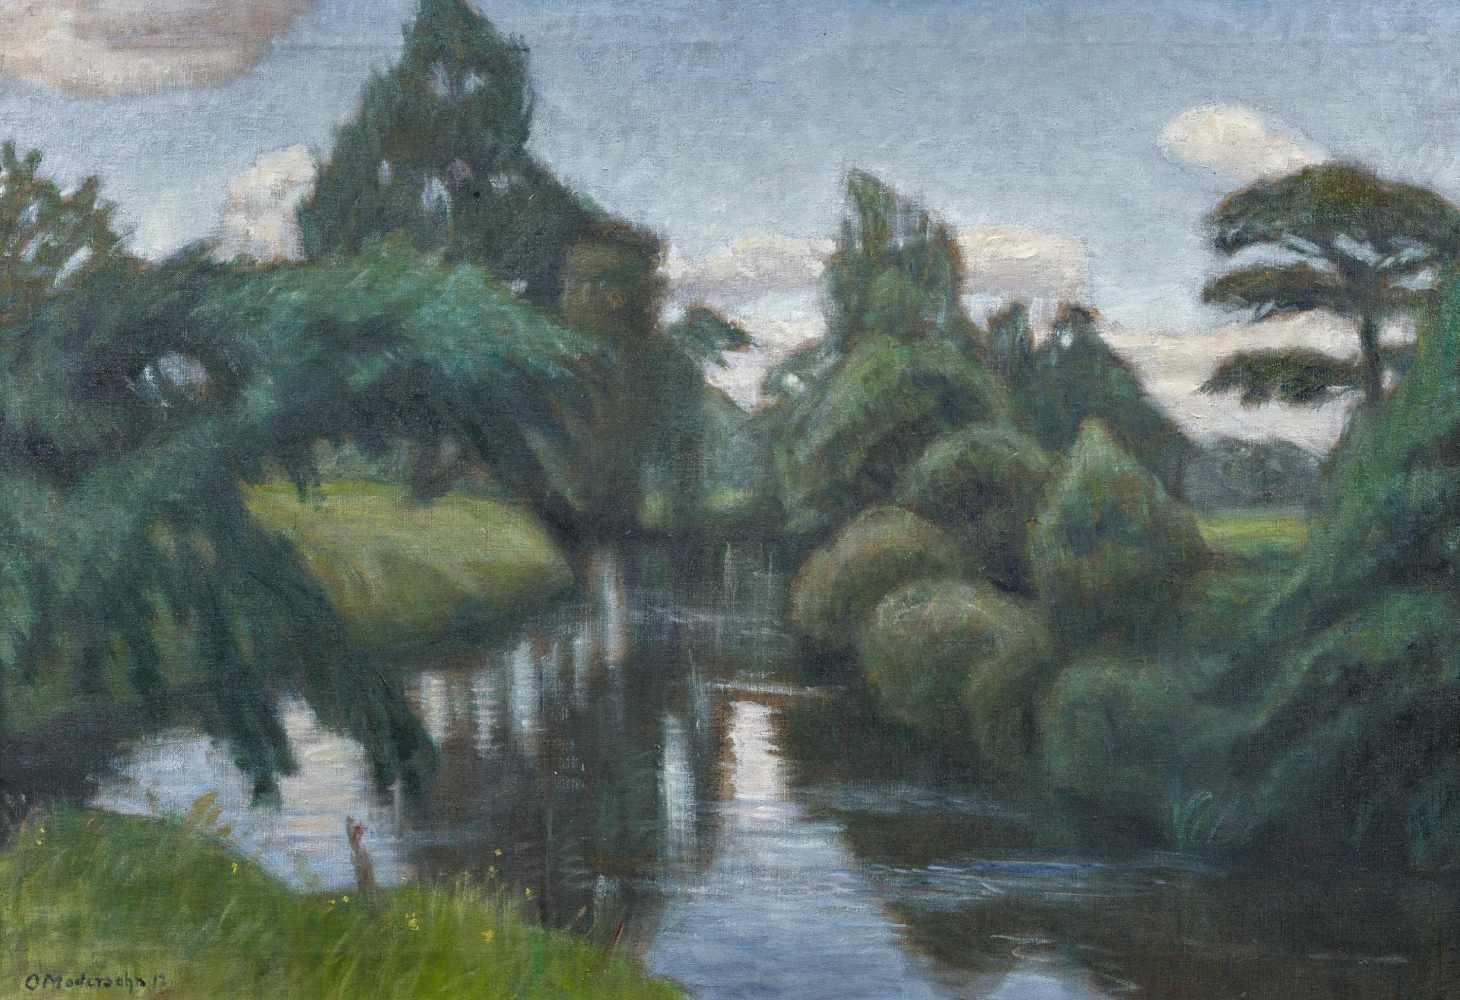 Los 51 - Modersohn, Otto1865 Soest - 1943 RotenburgSommerlandschaft an der Wümme. 1912. Oil on canvas. 64 x